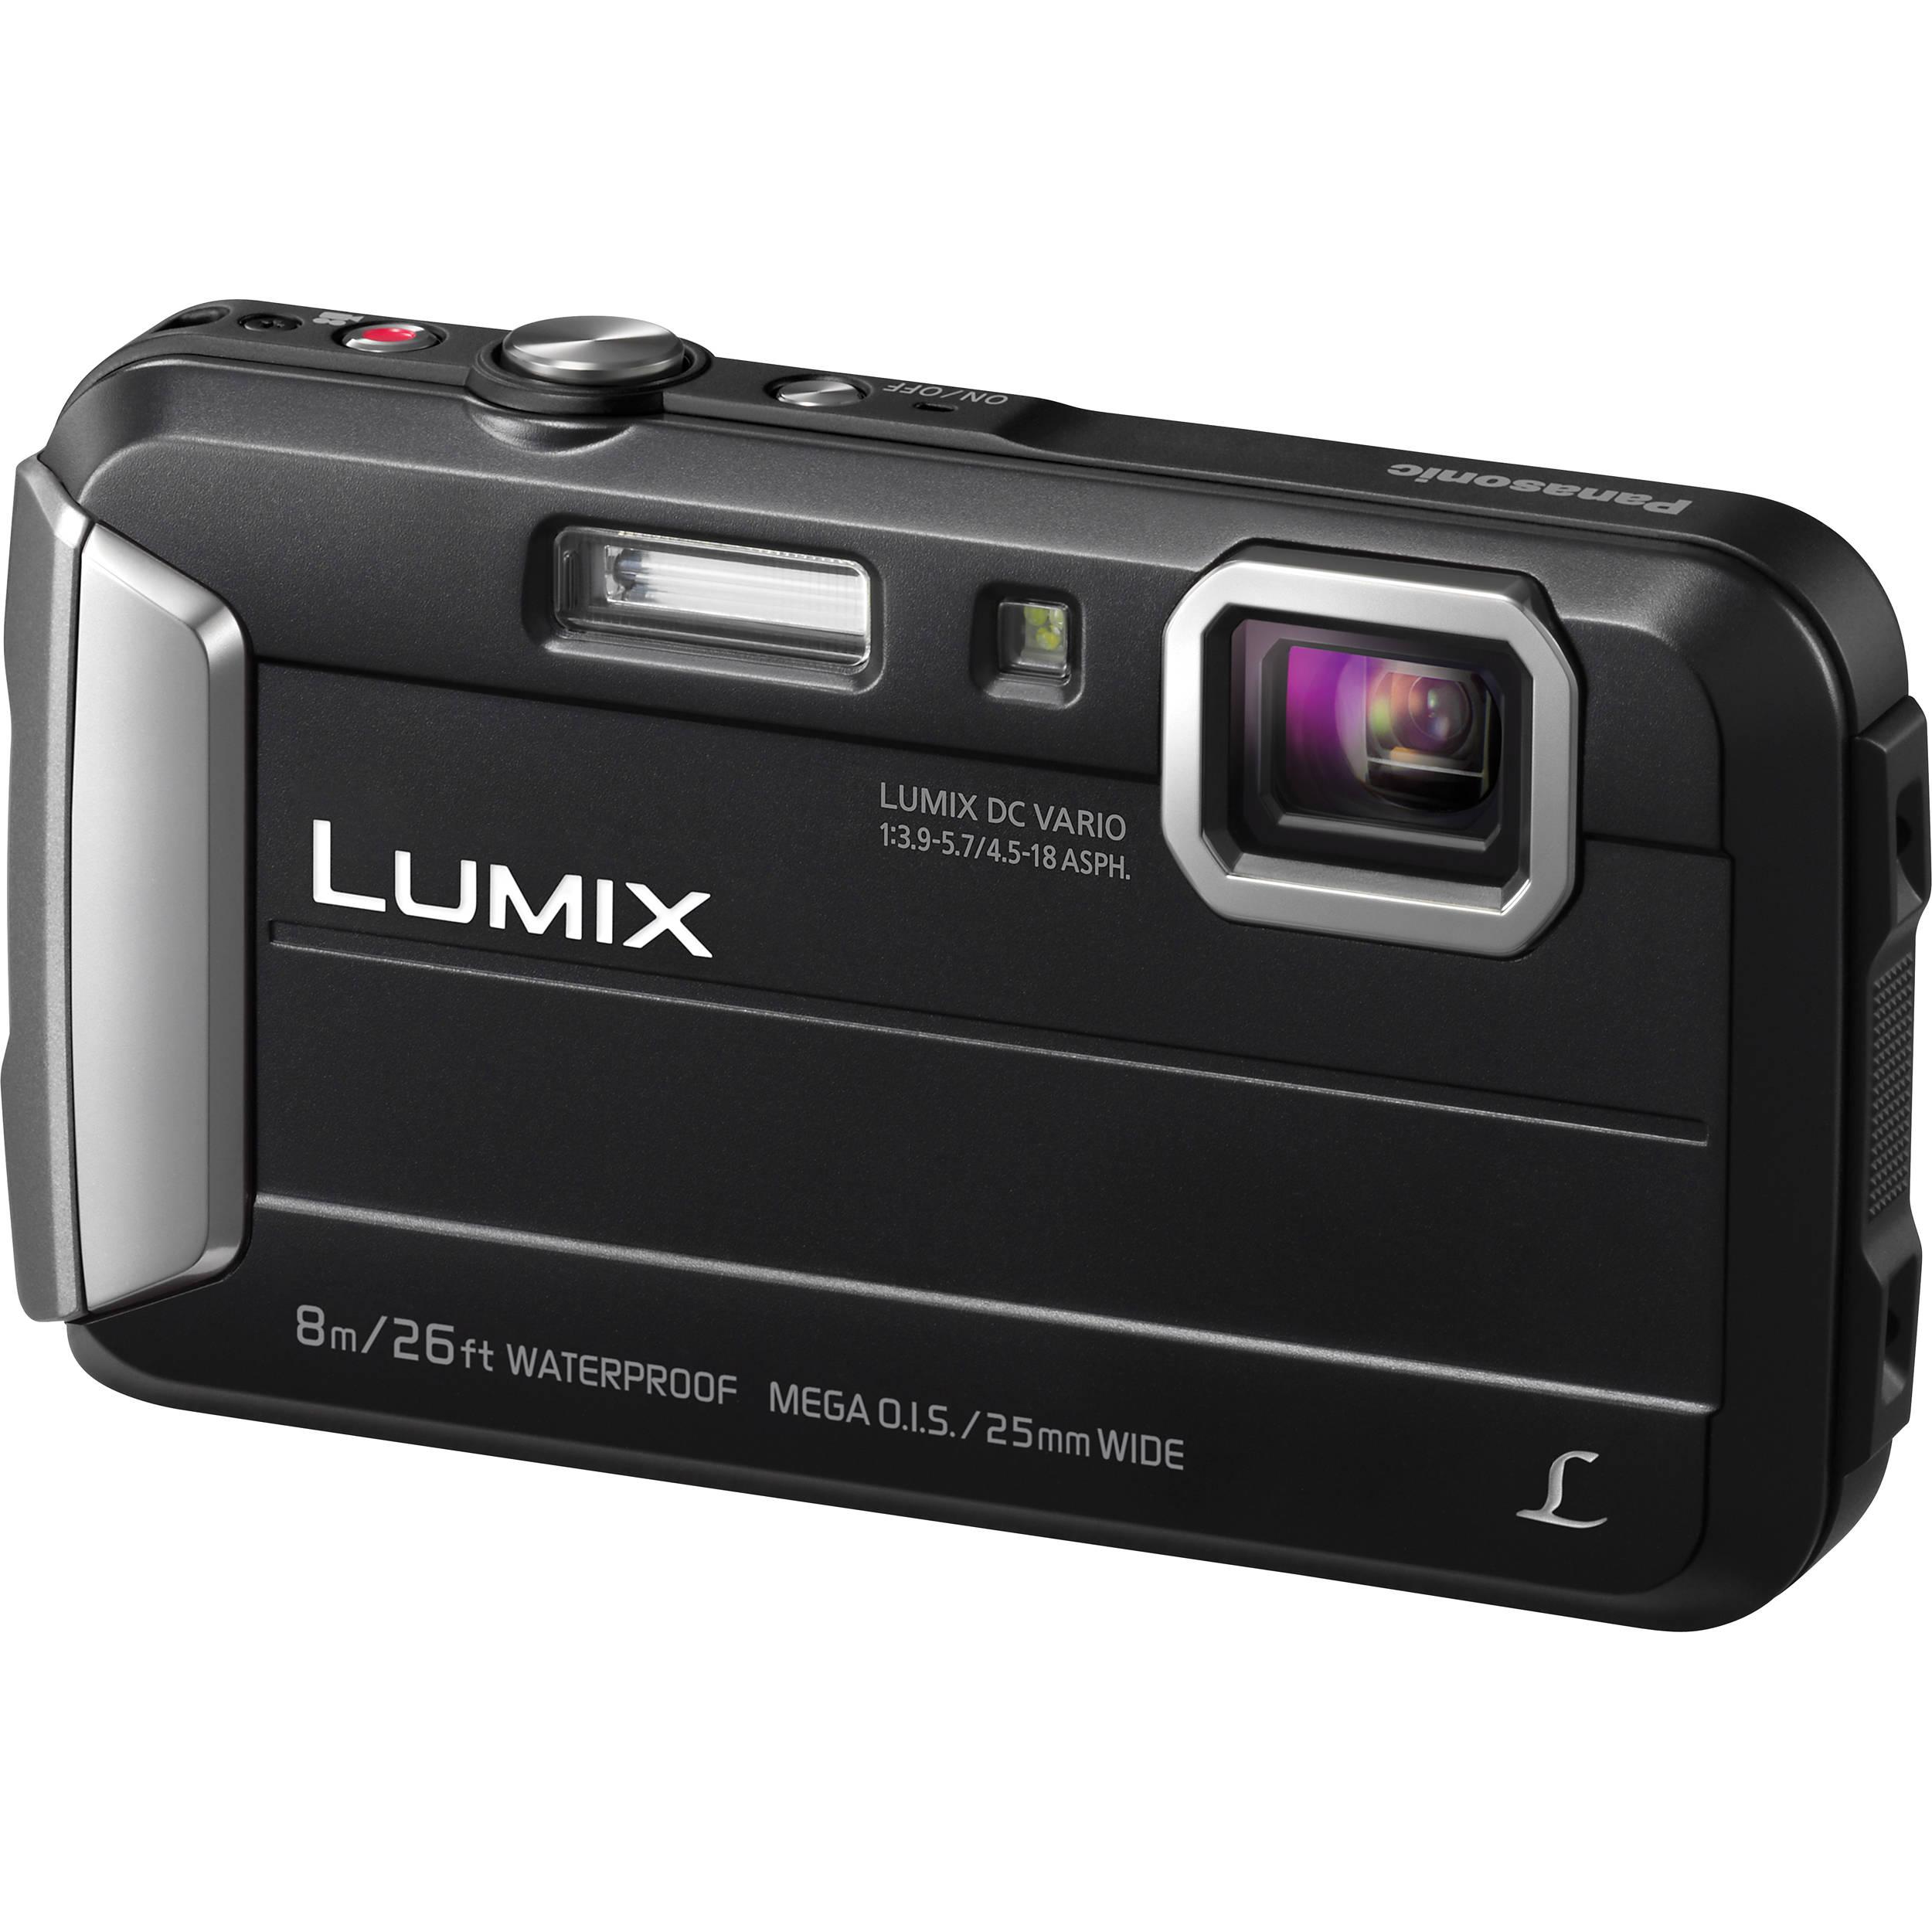 Panasonic Lumix DMC-TS30 Digital Camera (Black) DMCTS30K B&H